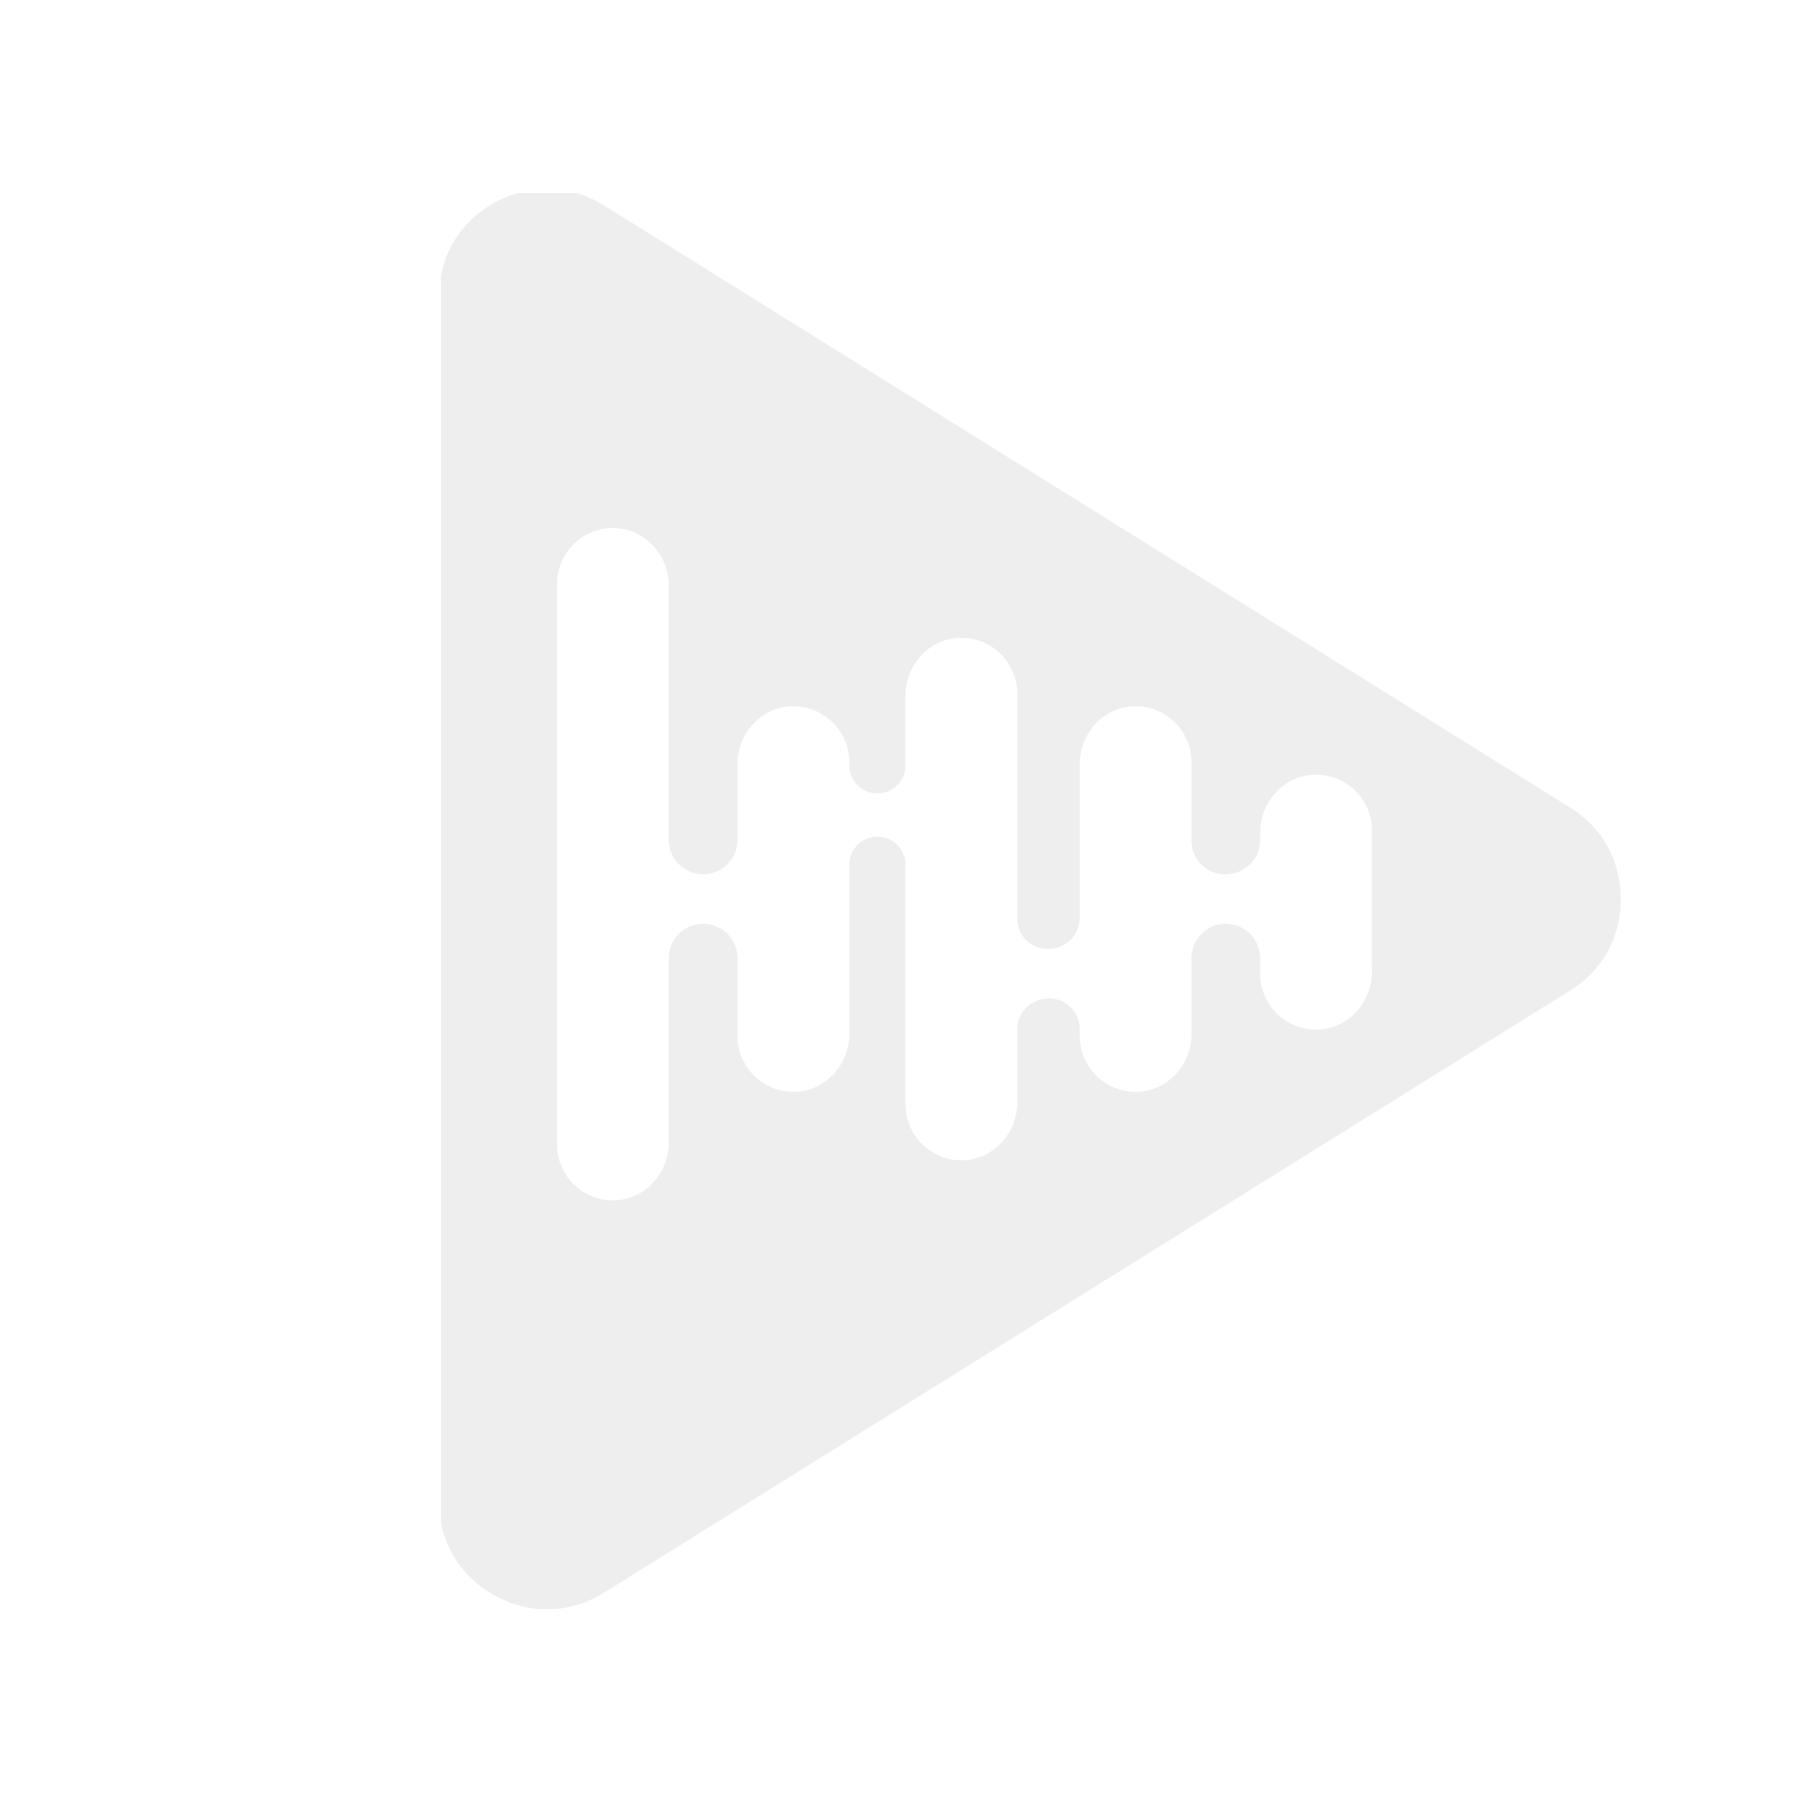 Speedsignal B-3474791